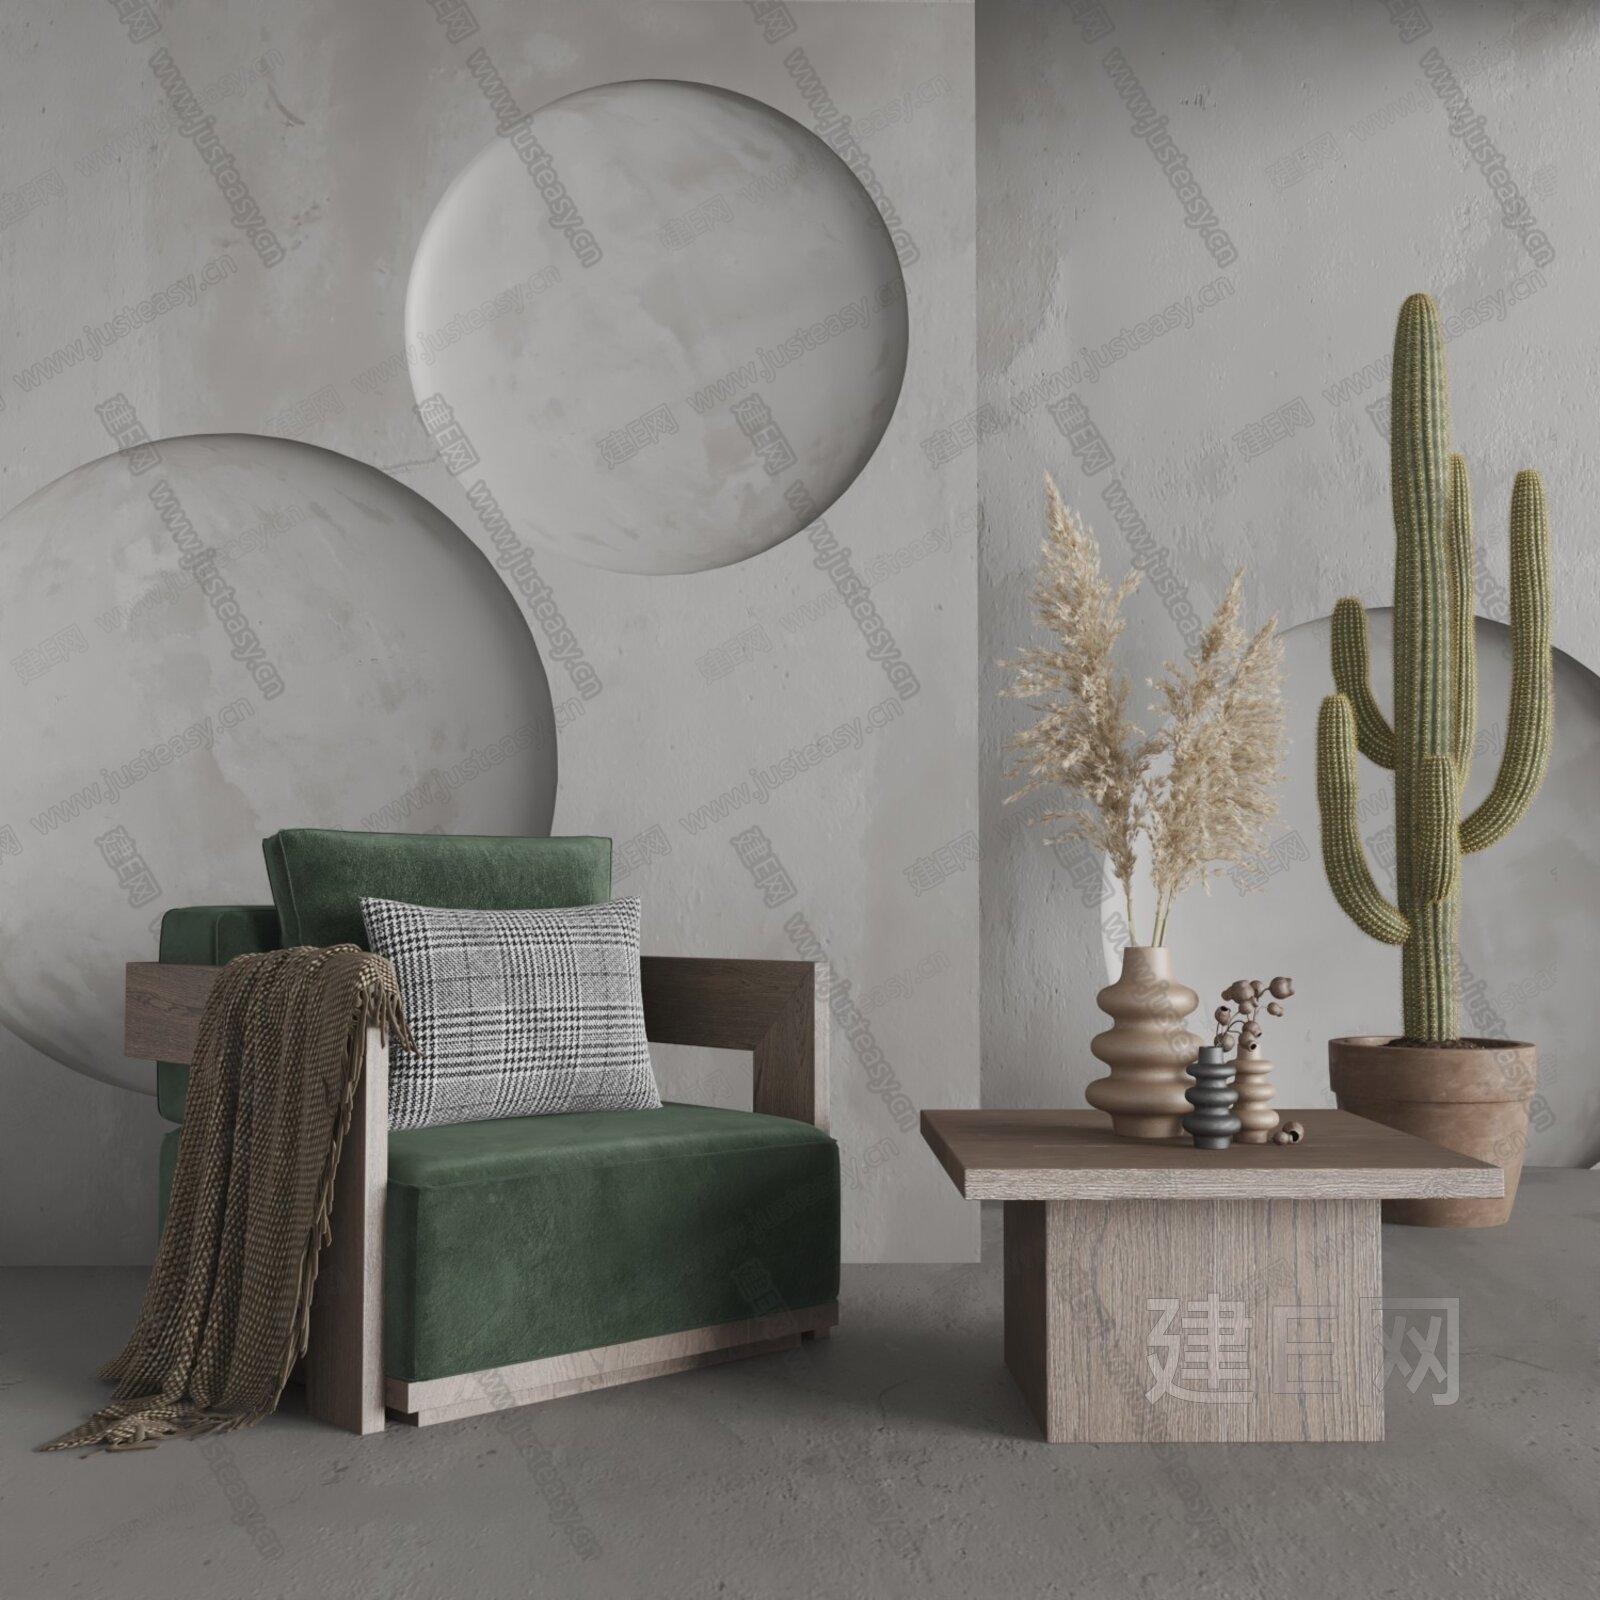 Morelato 现代单人沙发3d模型